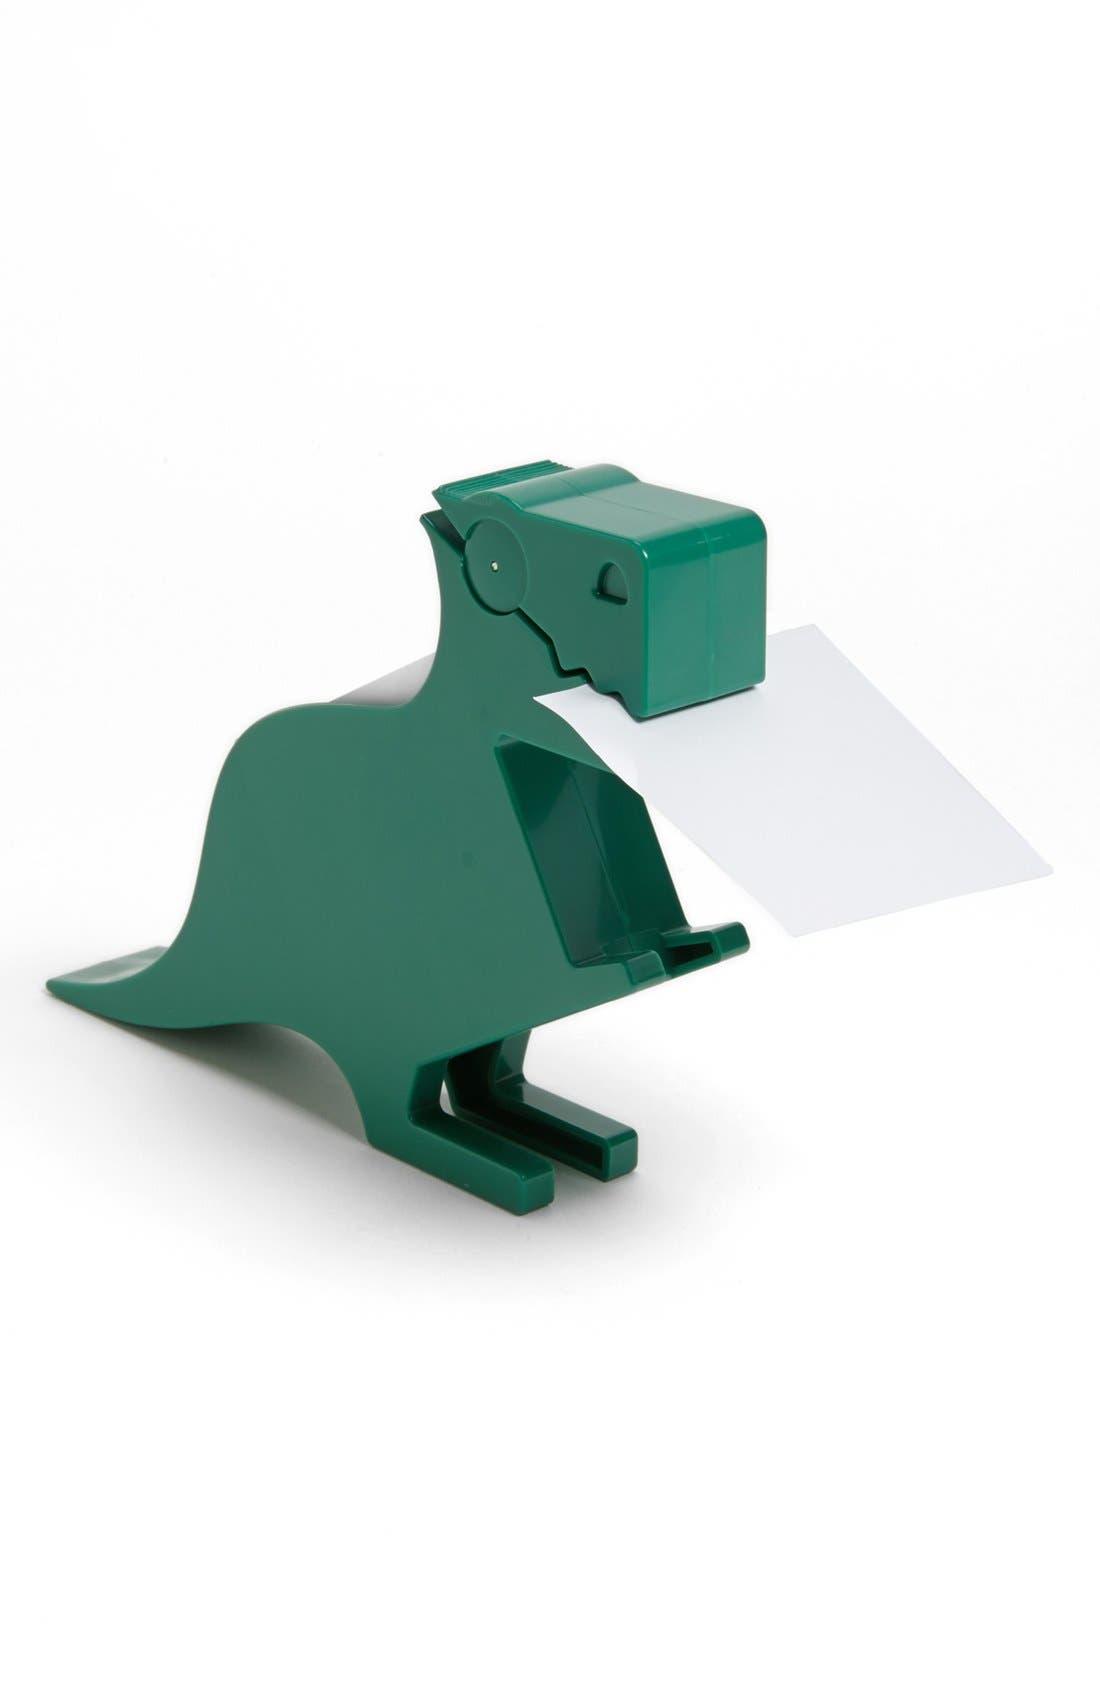 Main Image - Kikkerland Design 'Dino' Memo Holder